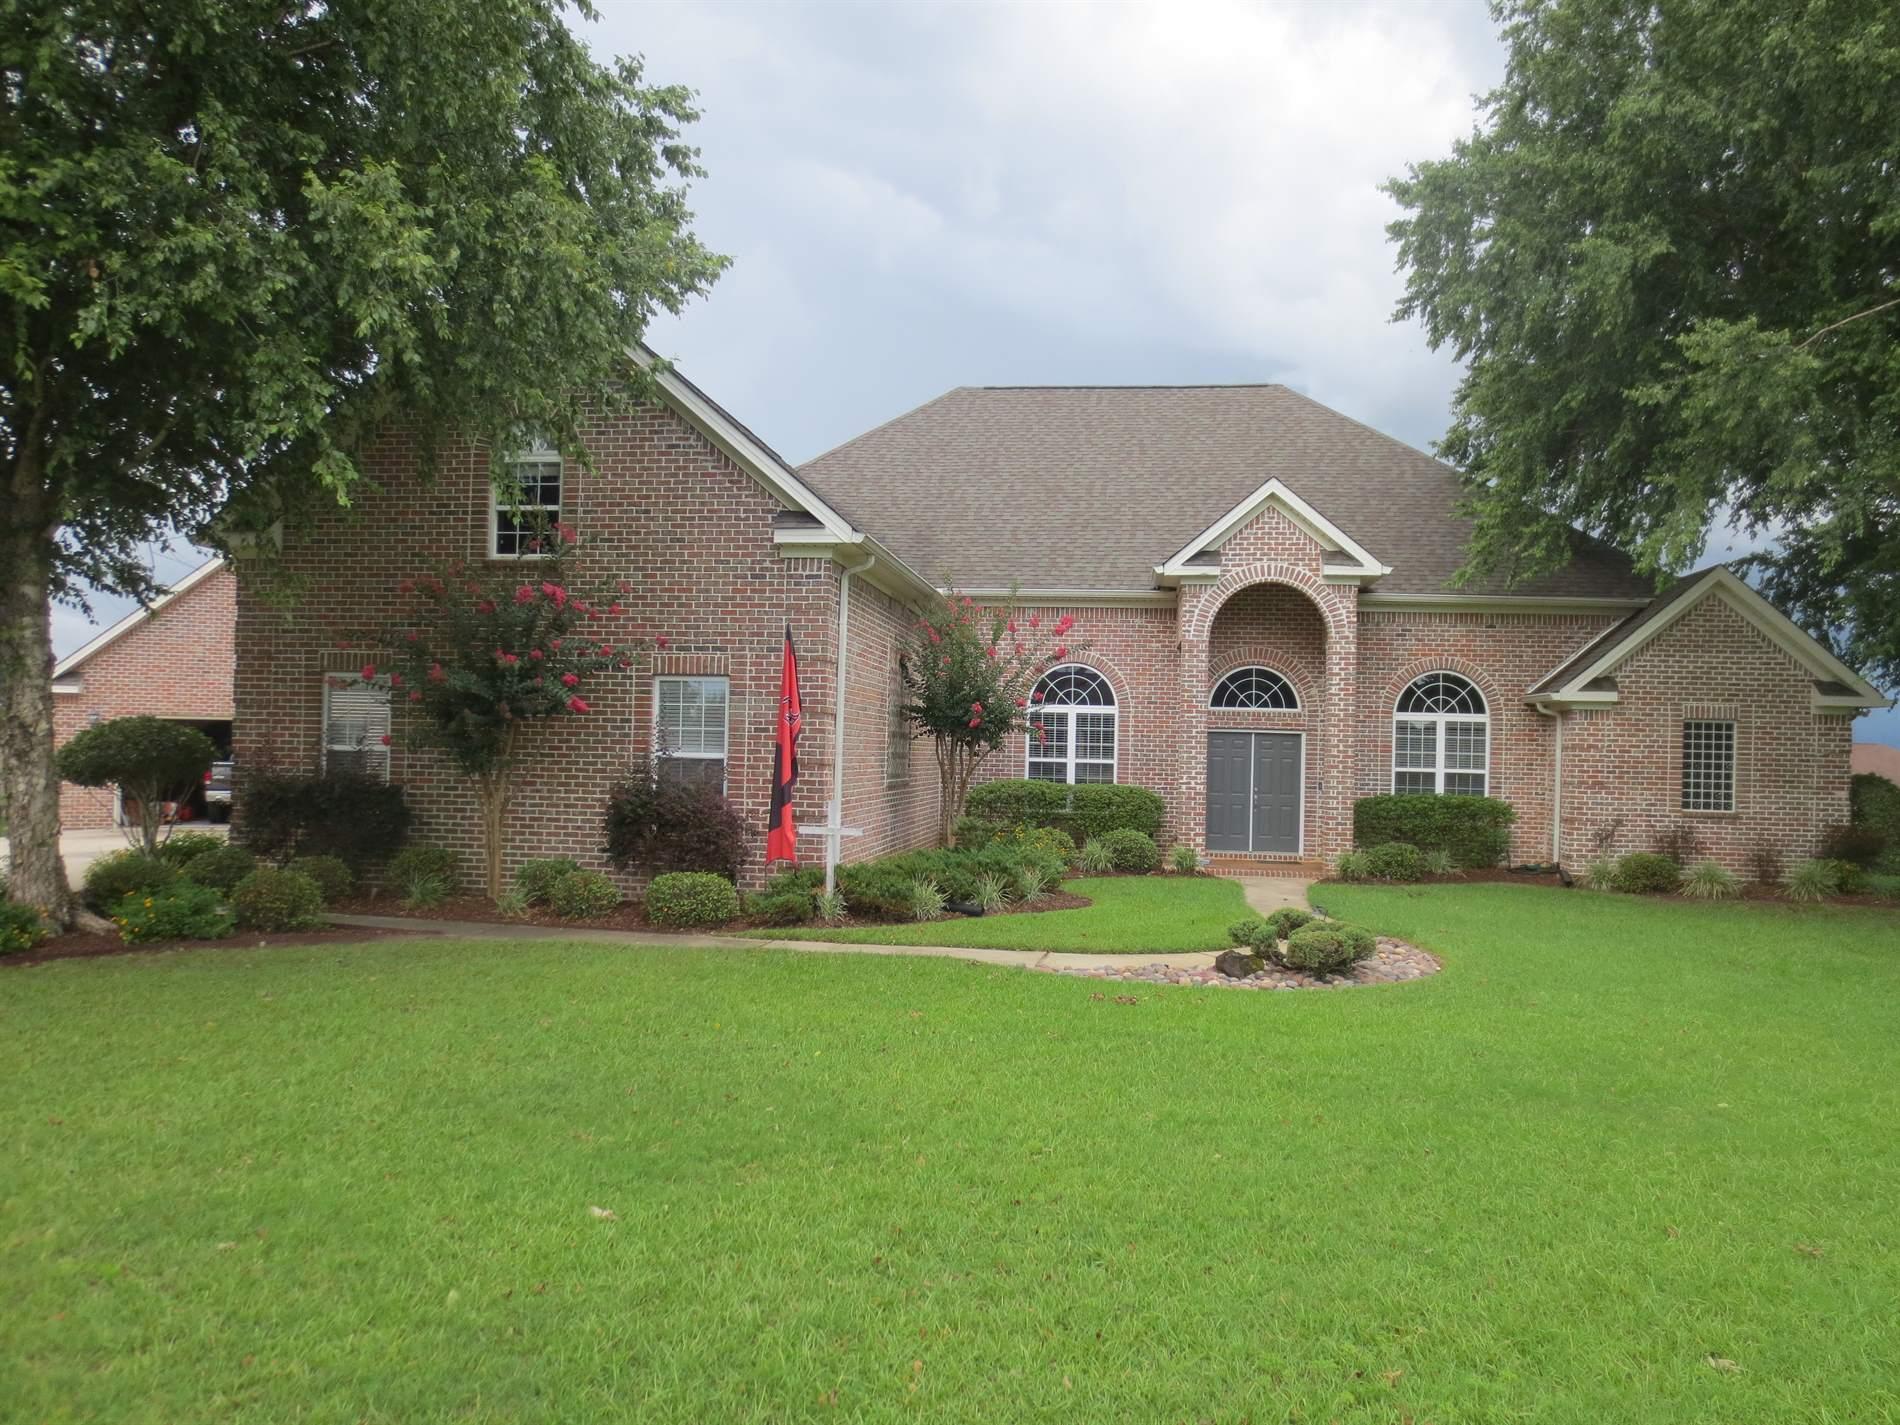 104 Magnolia Crest, Kathleen, GA 31047